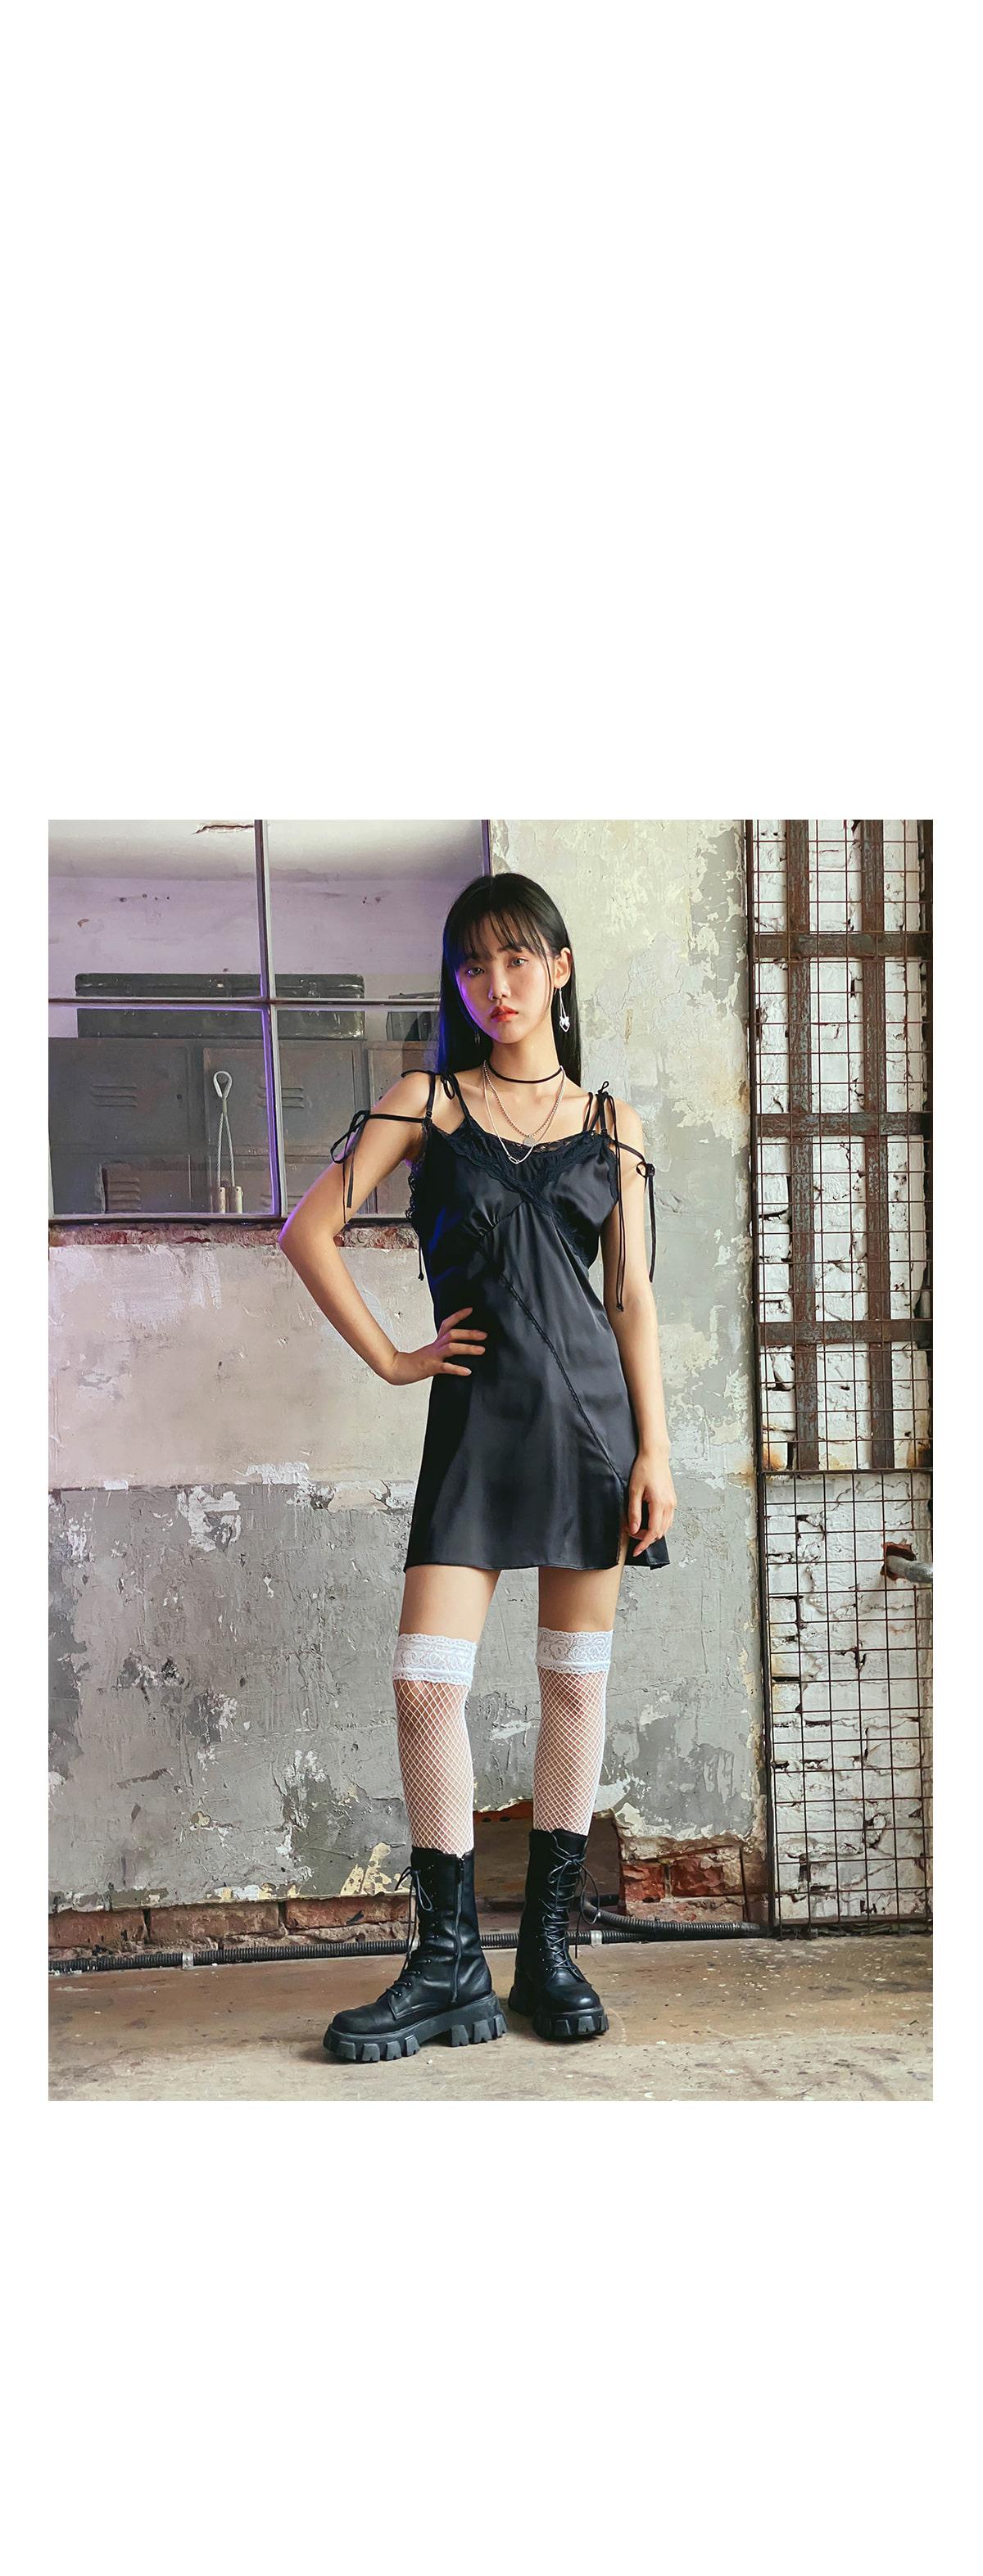 T-shirt slip dress